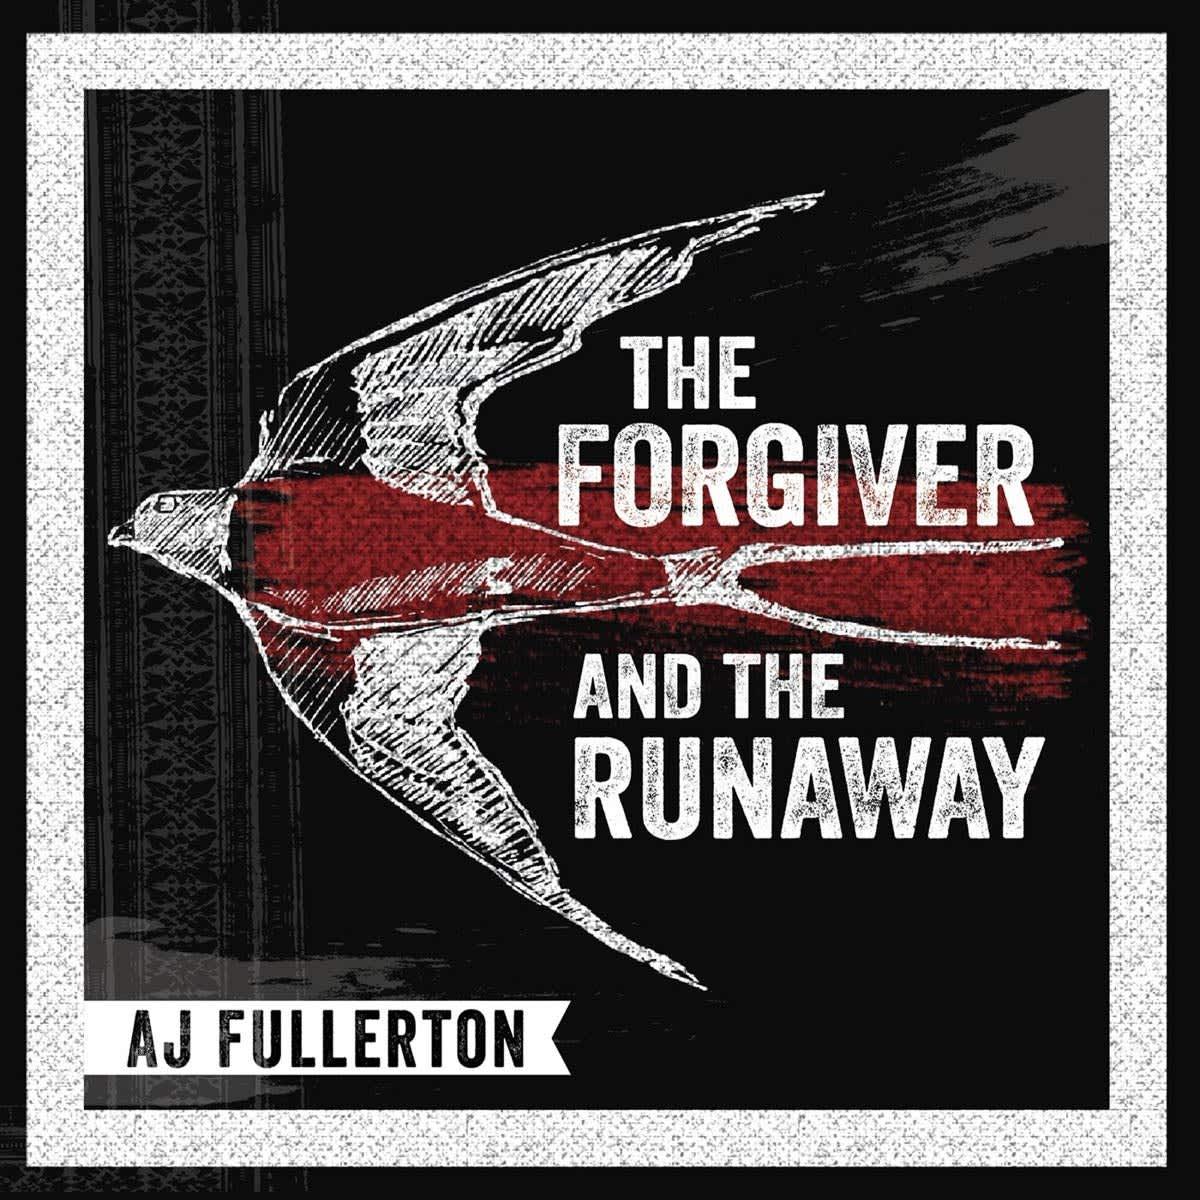 AJ Fullerton - The Forgiver and The Runaway album